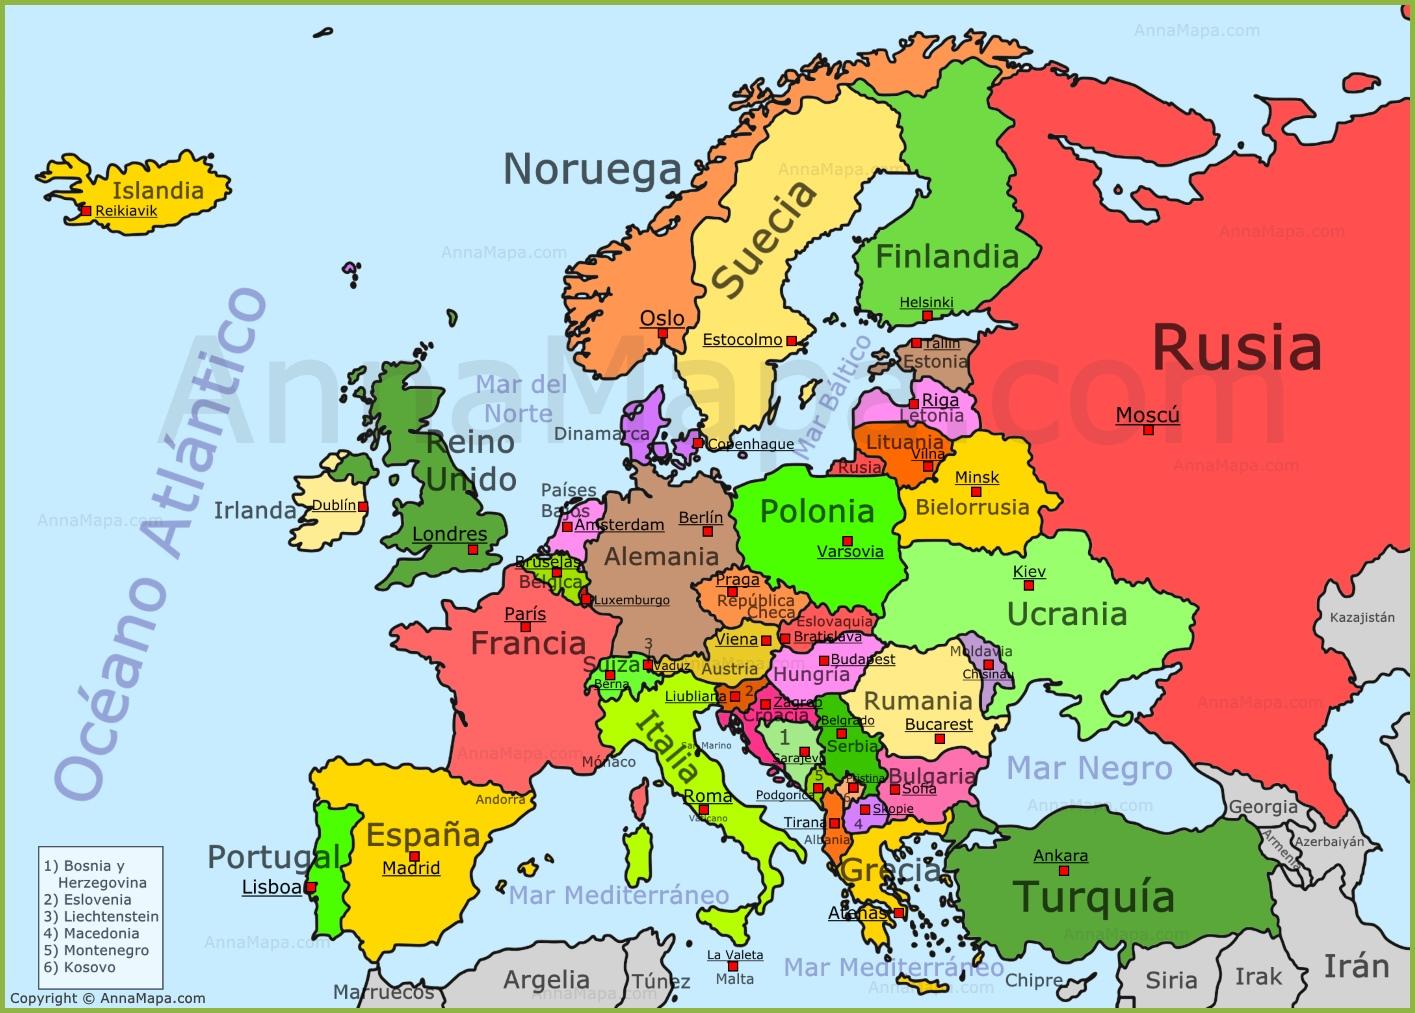 Mapa De Europa Con Paises.Mapa De Europa Mapa Politico De Europa Paises De Europa Annamapa Com